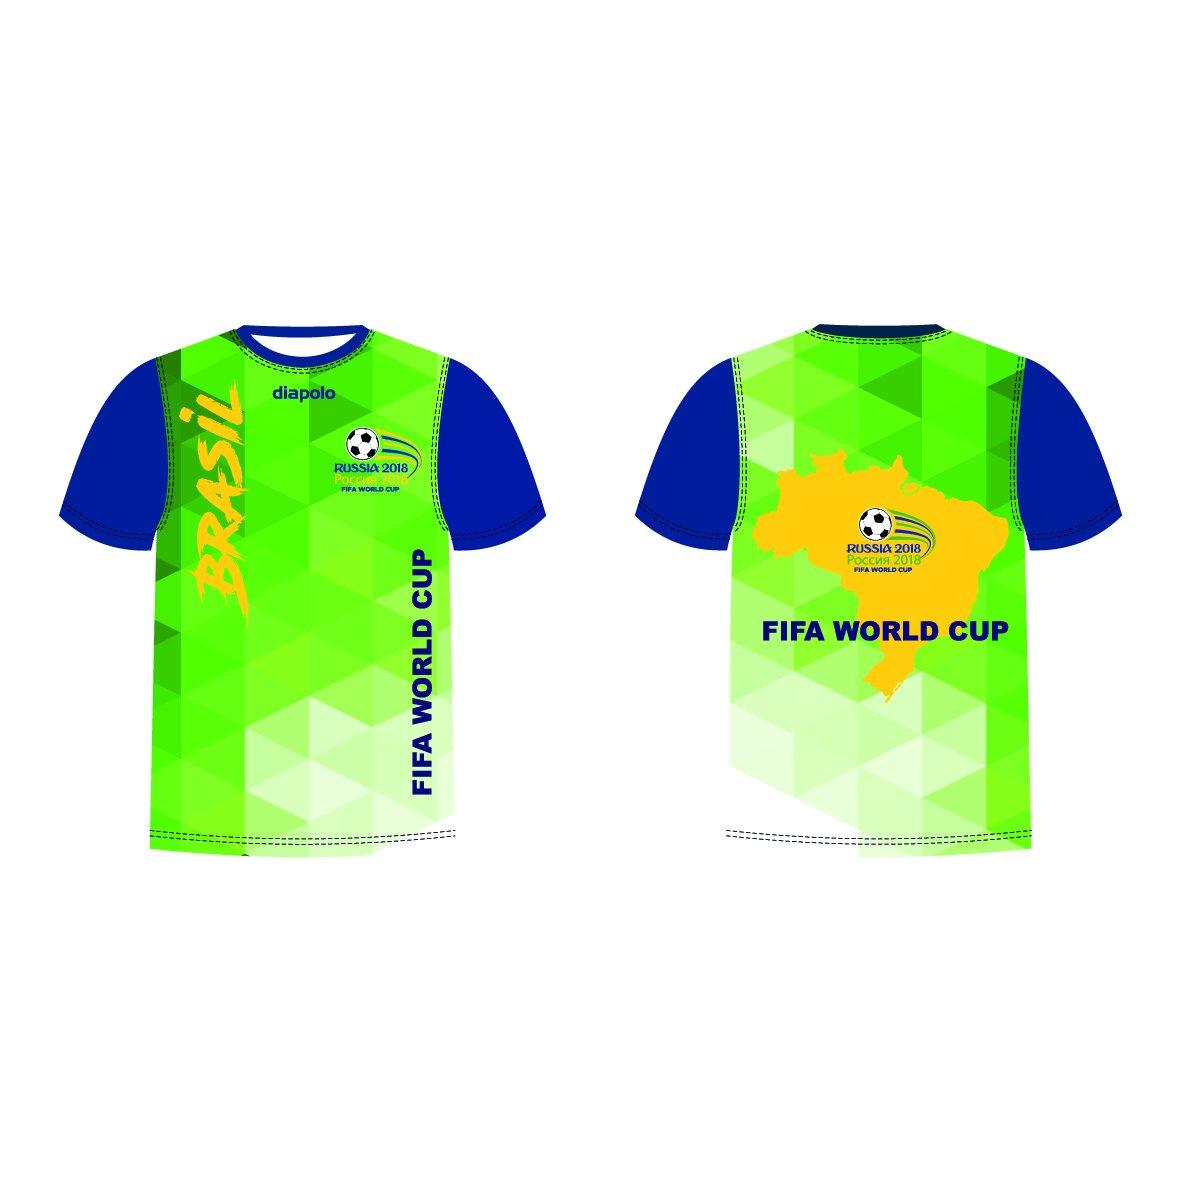 Diapolo Professional Atmungsaktiv Qualitativ Hochfertiger Funktion Fan T-Shirt Brasil S M L XL XXL